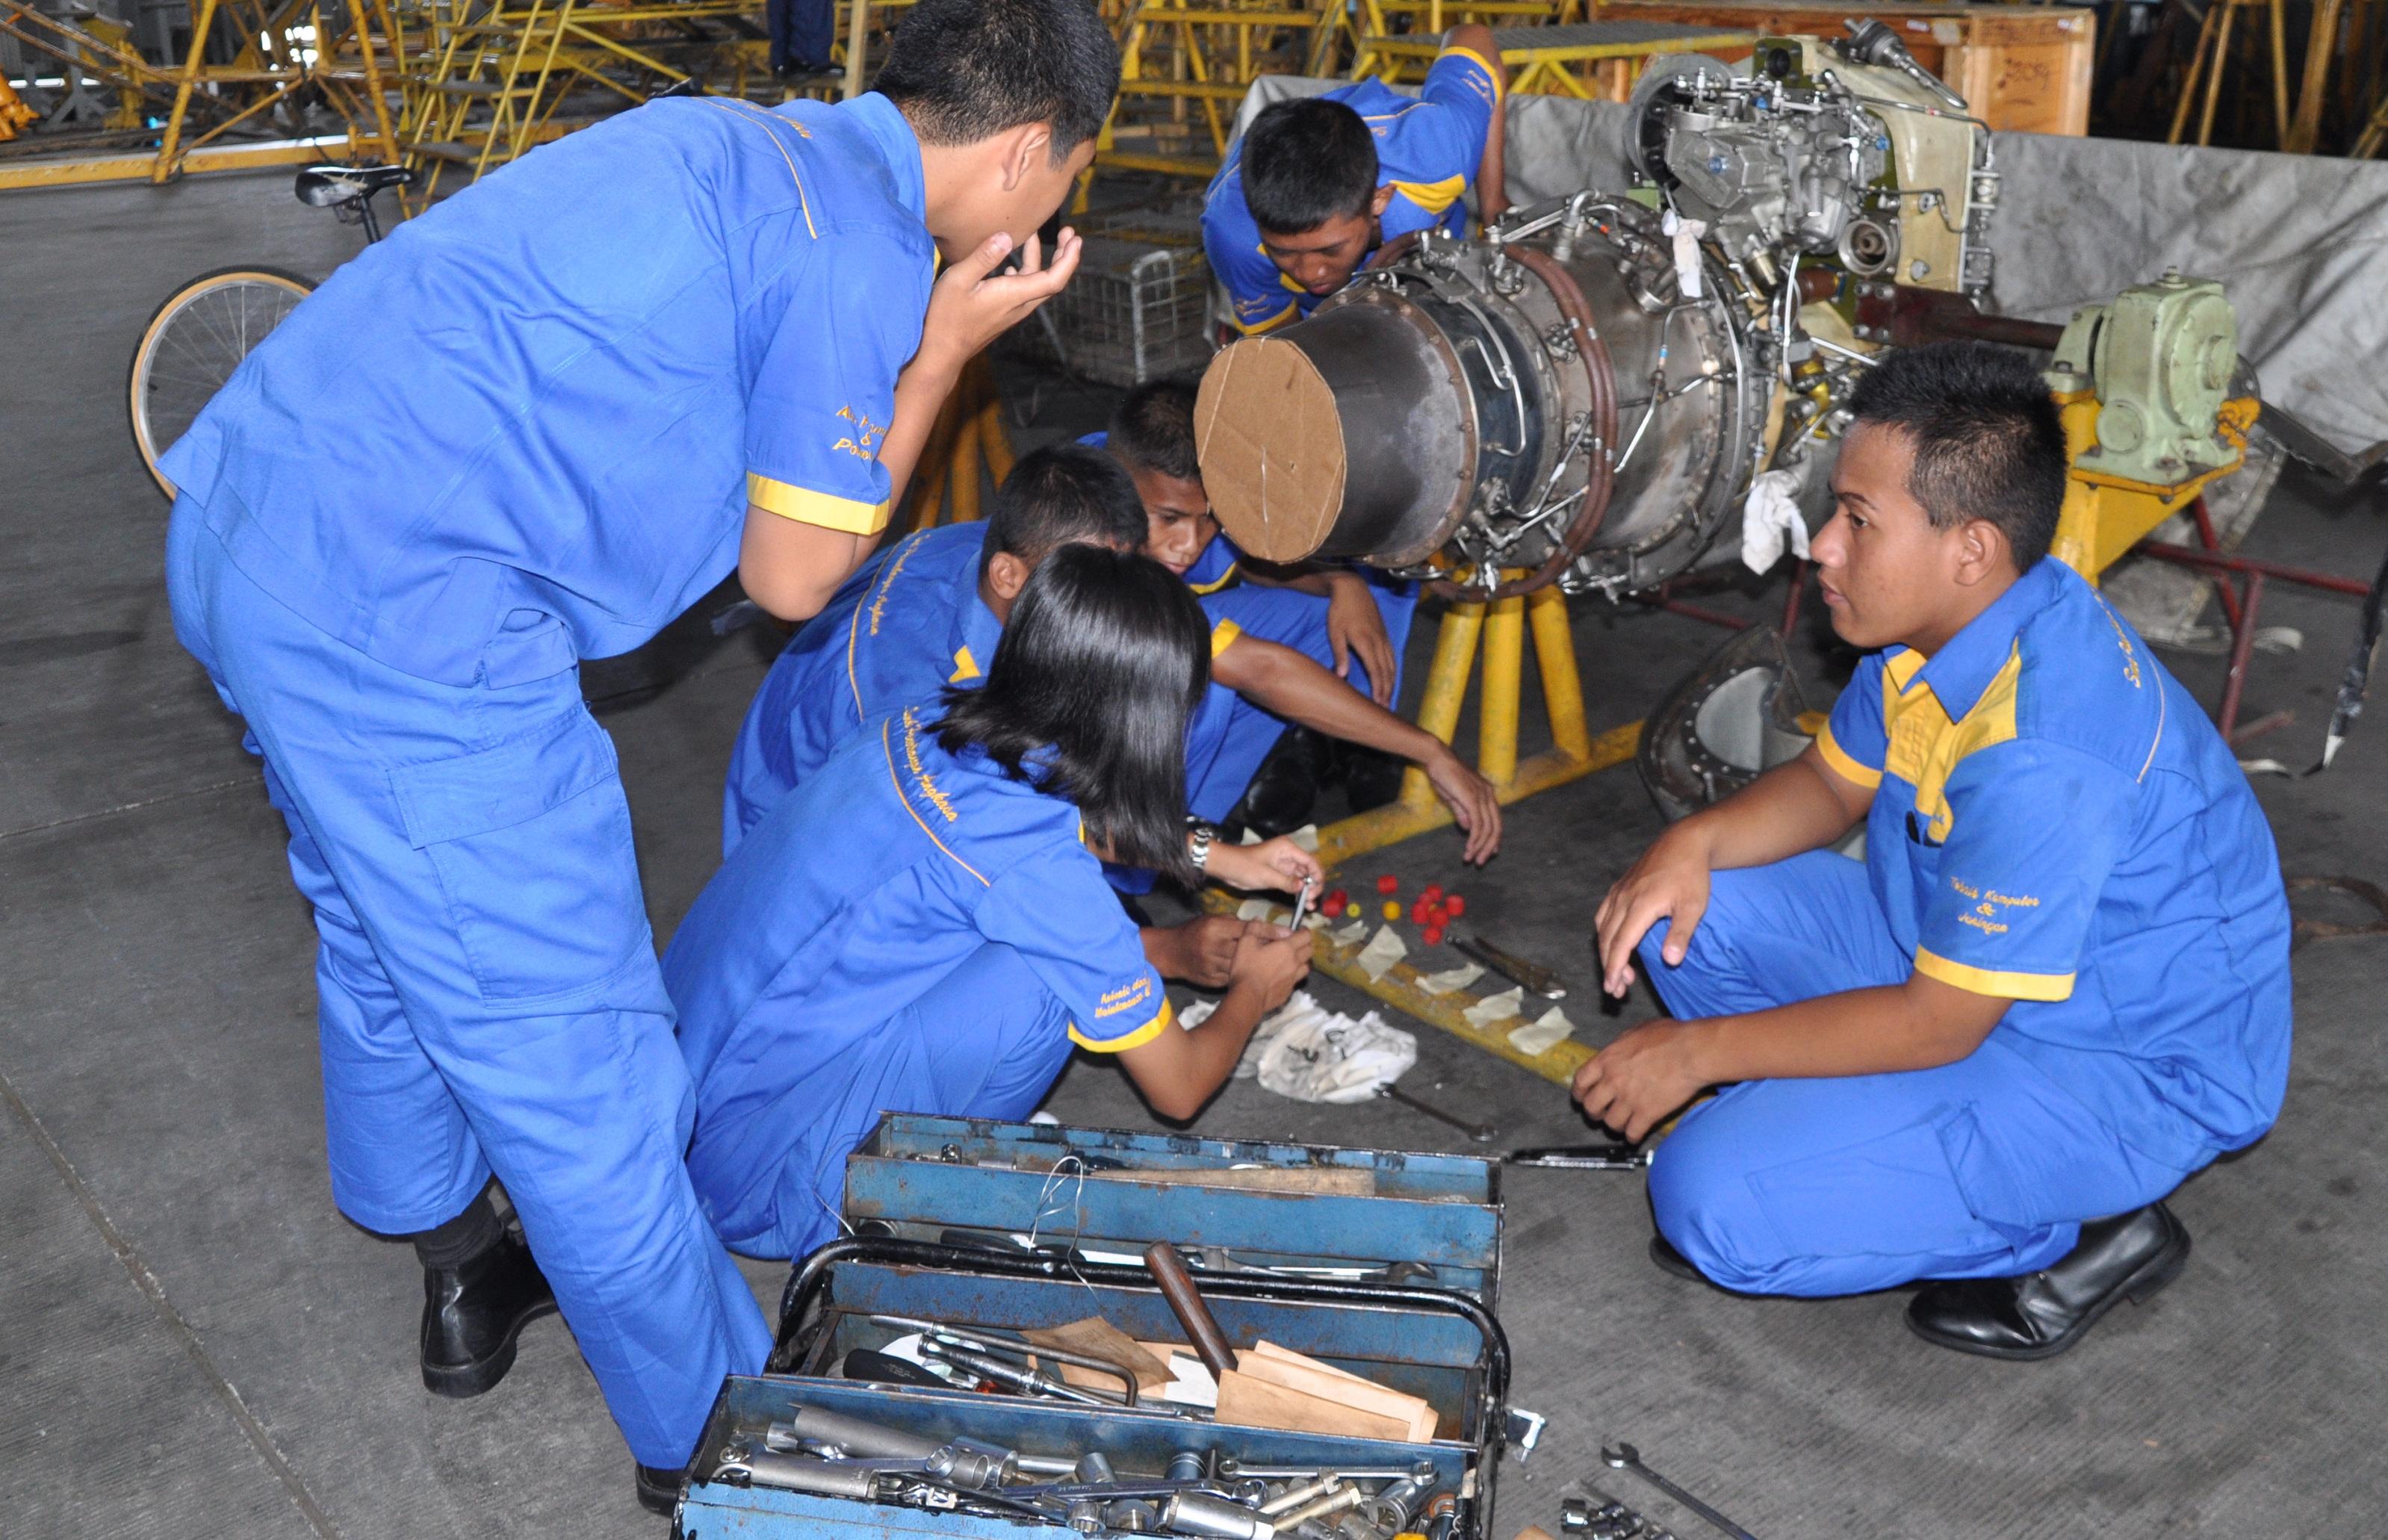 Dsc on Turbine Engine Monitoring System